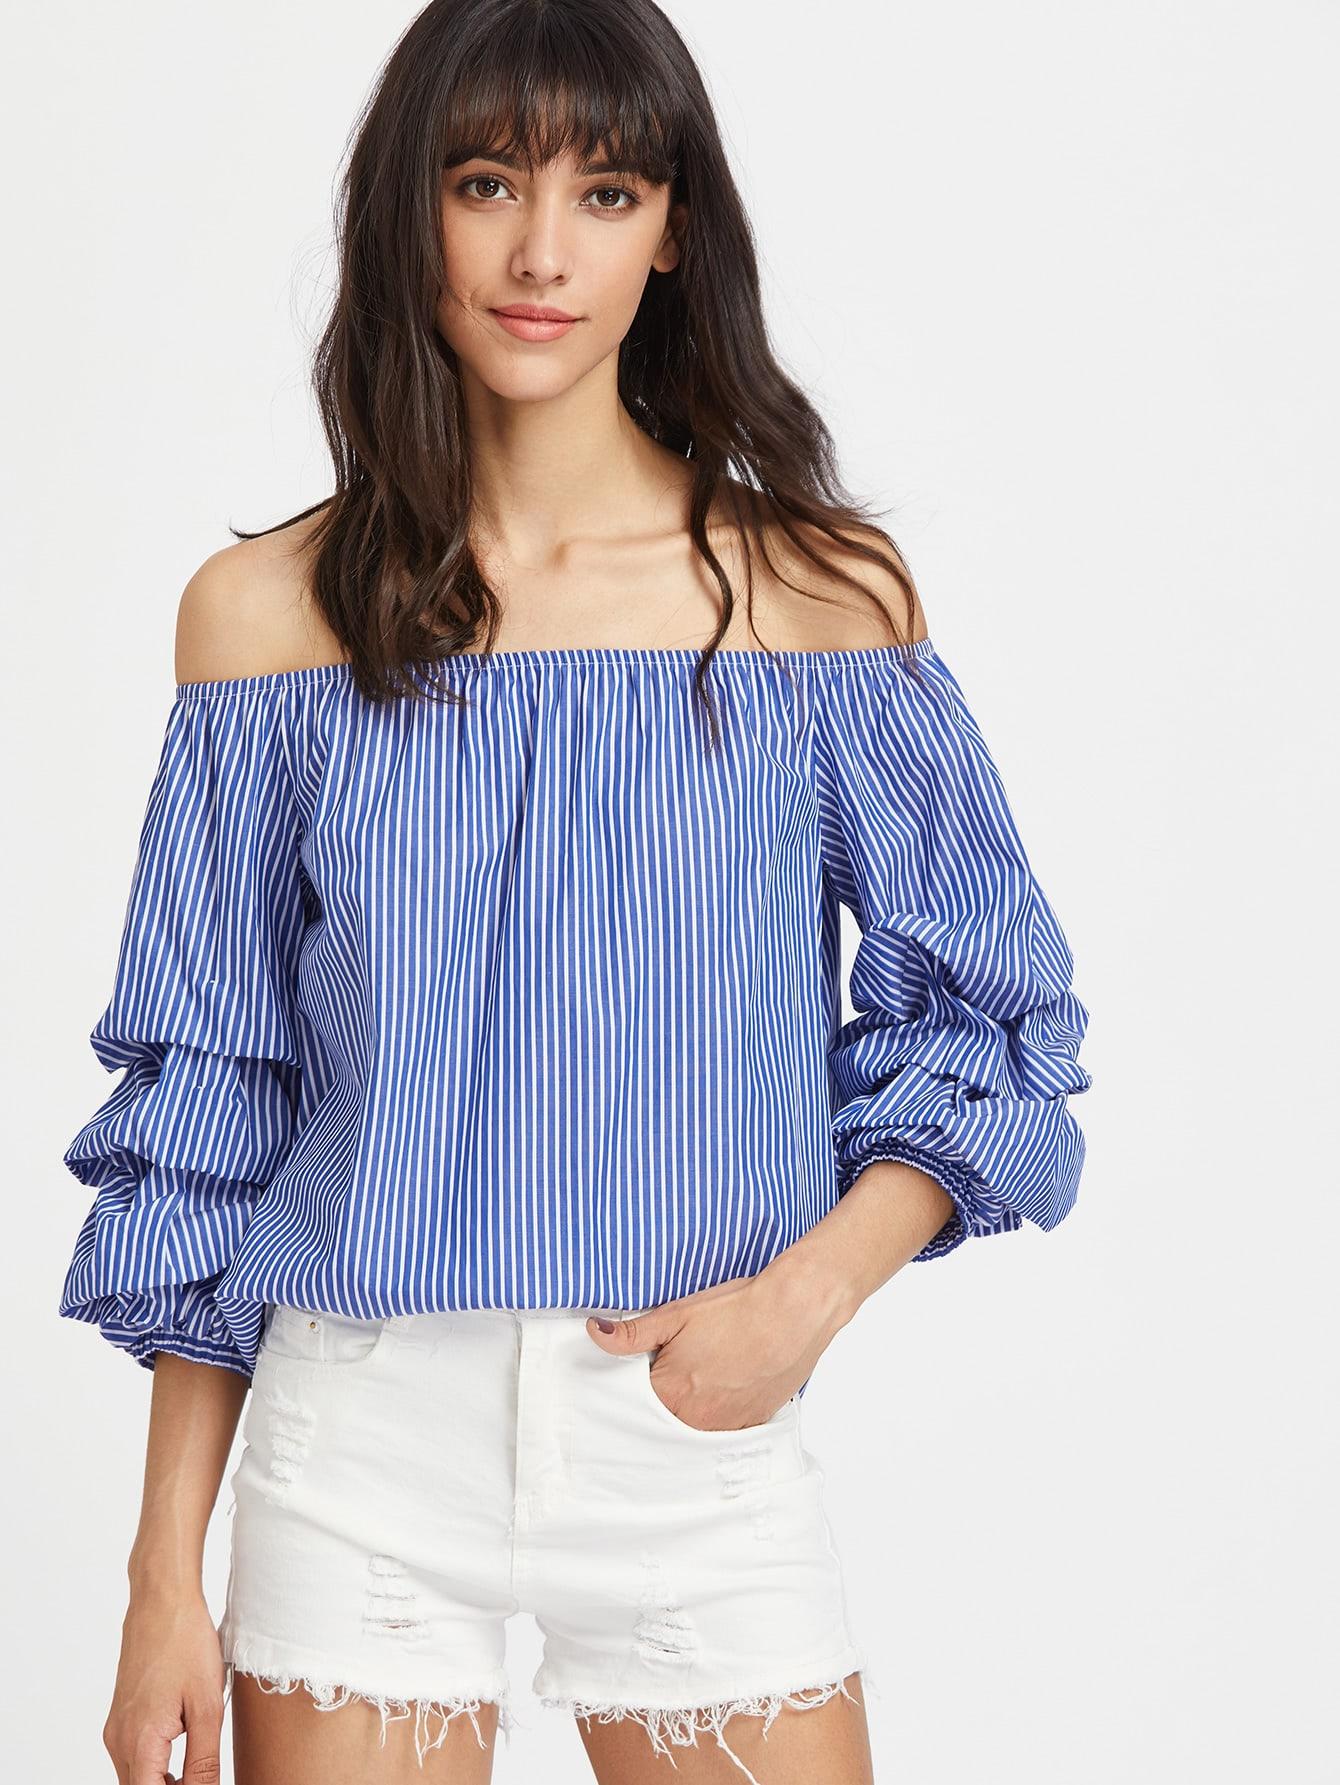 blouse170410702_2